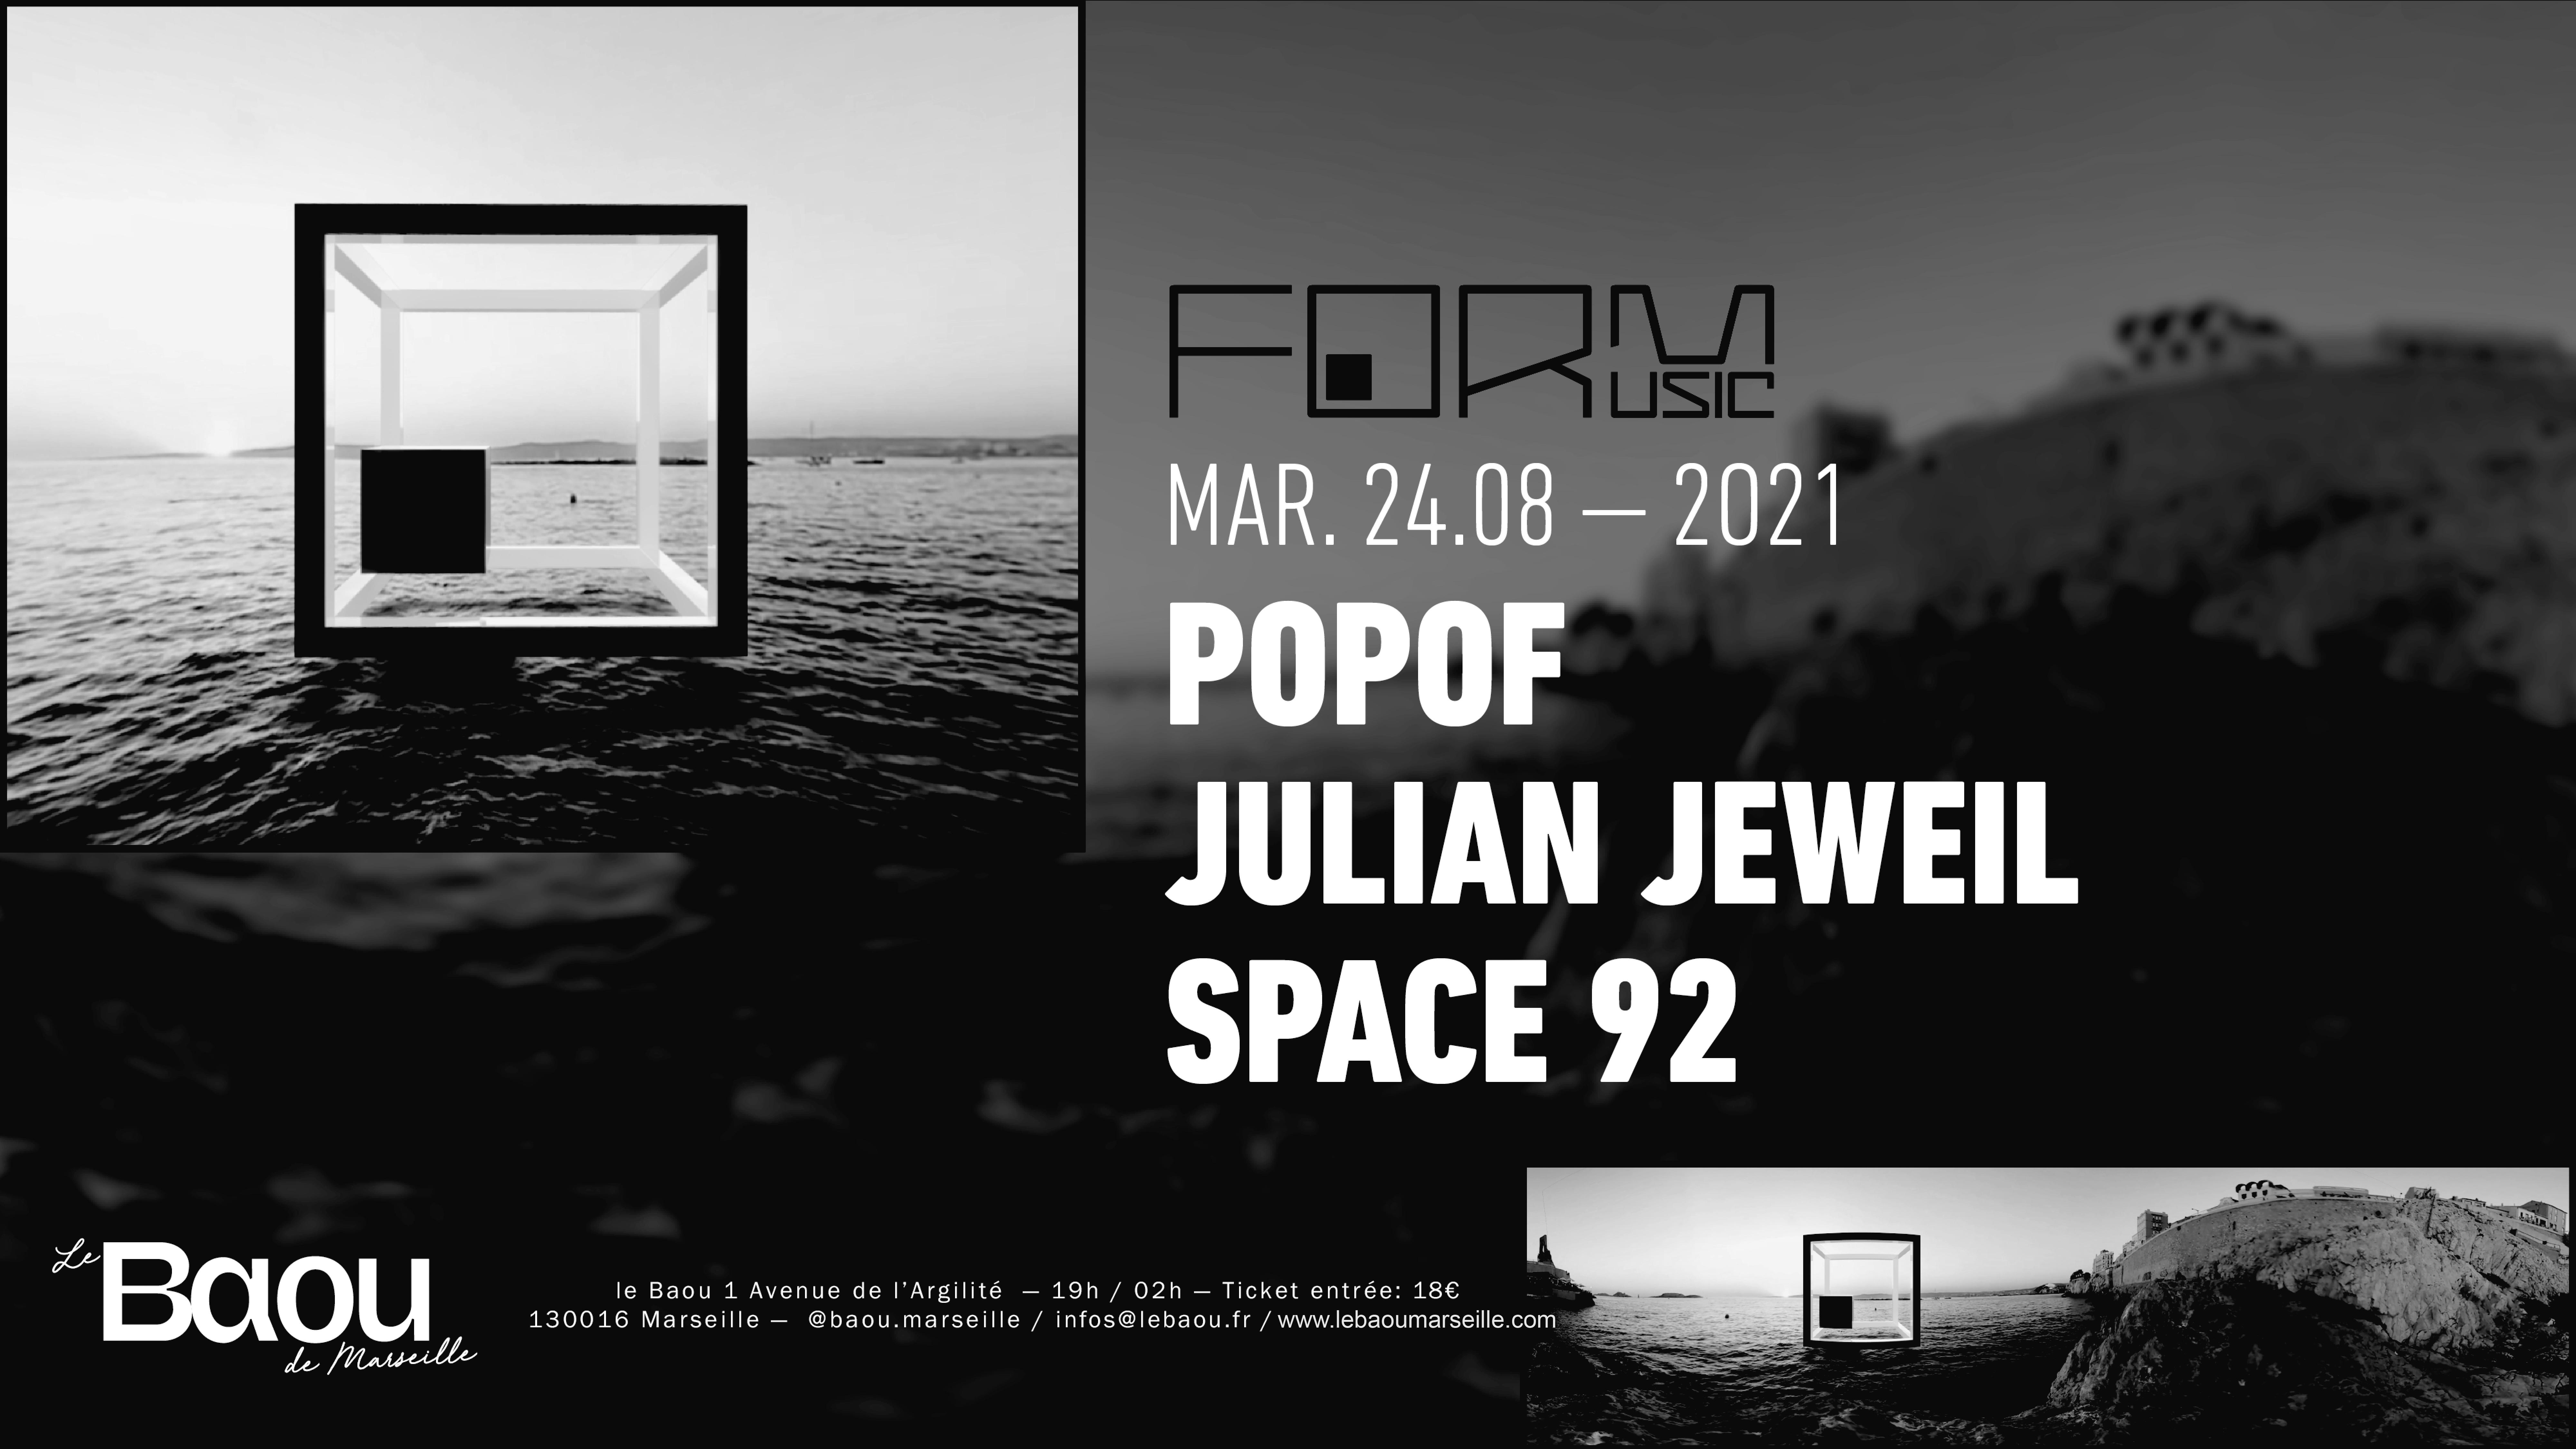 Baou X FORM Music : Popof / Julian Jeweil / Space 92